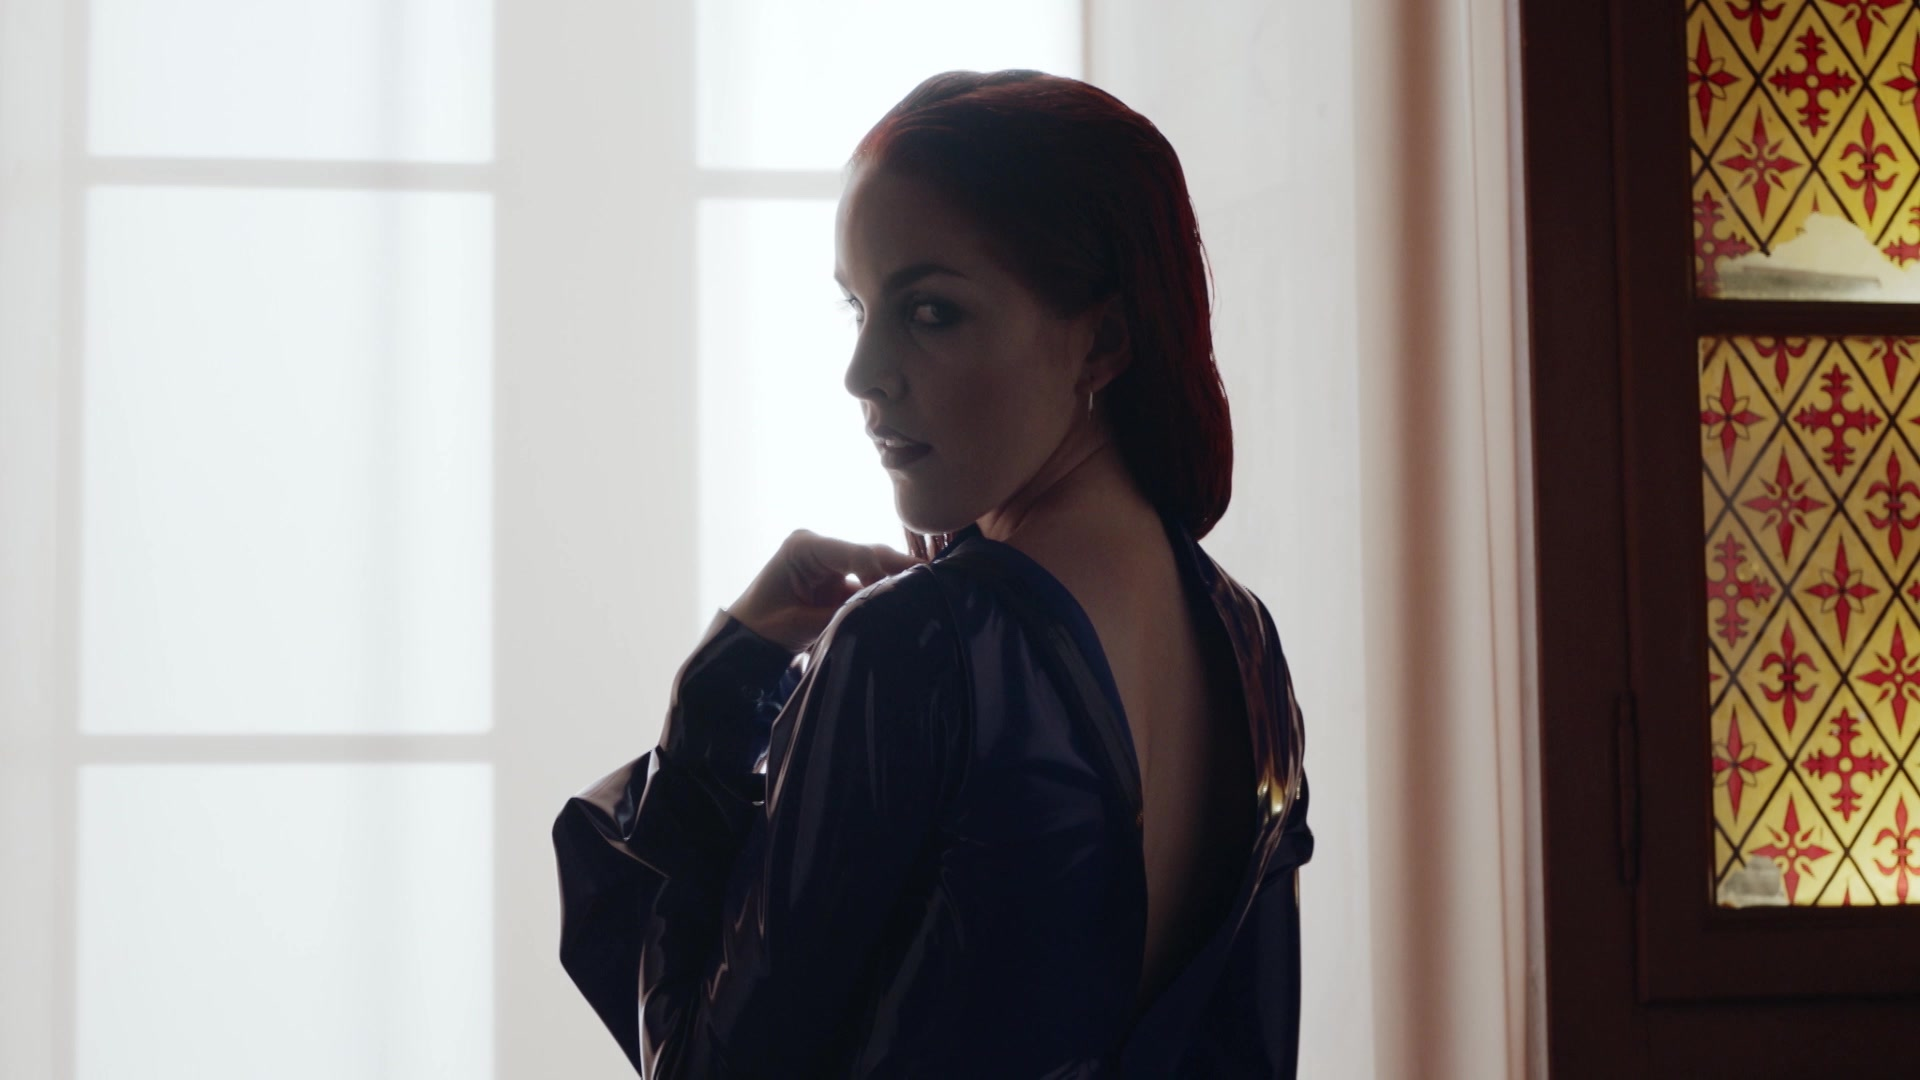 Playboy TV: XConfessions, Season 2 Ep. 5 48